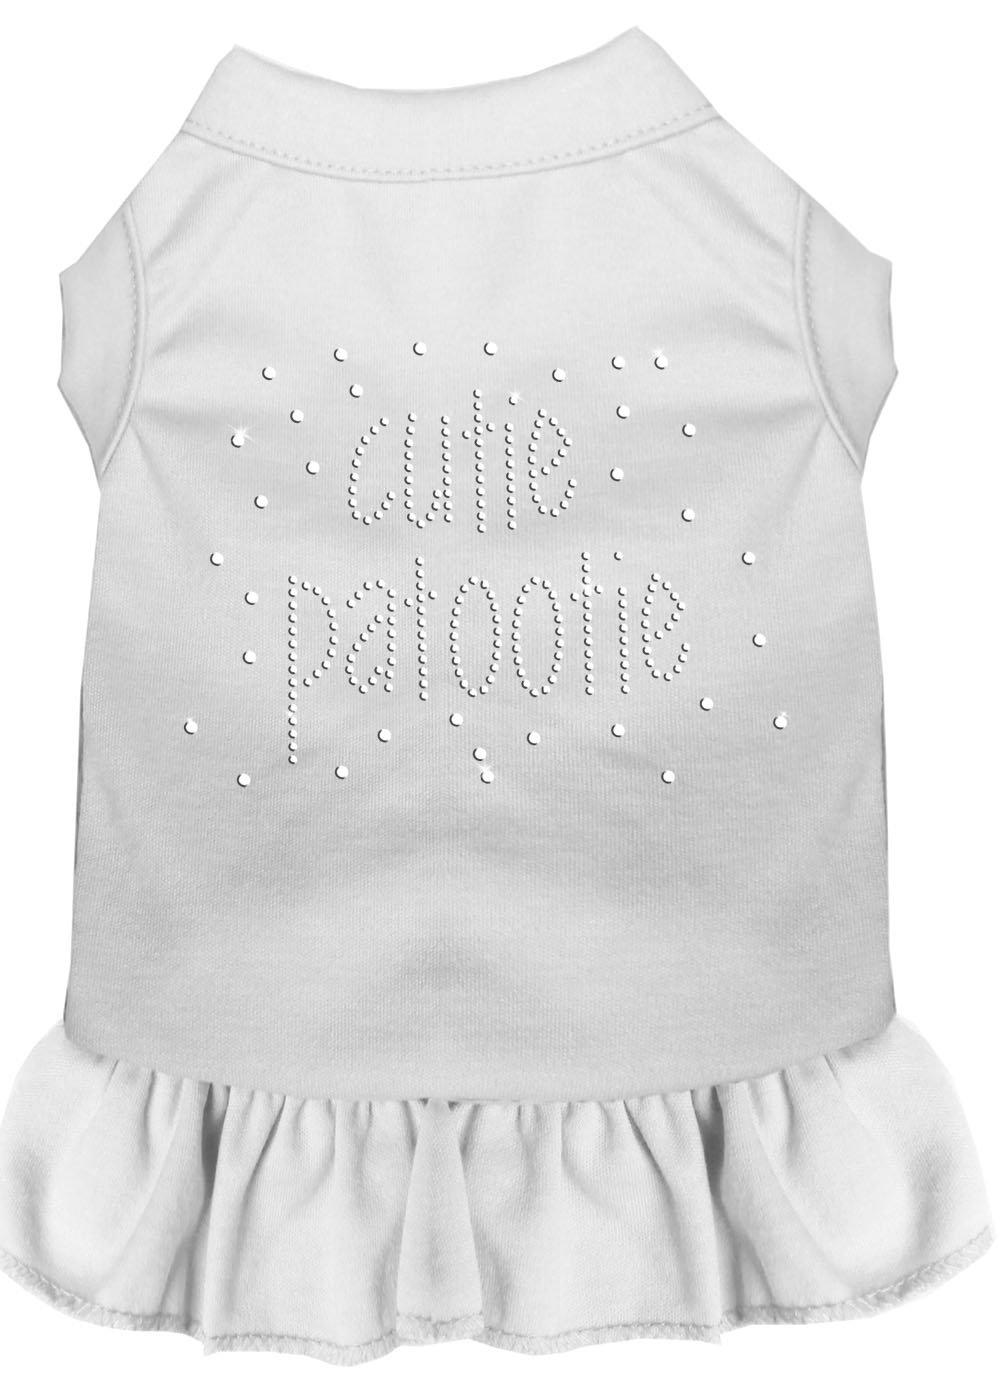 Mirage Pet Products Rhinestone Cutie Patootie Dress, X-Large, White